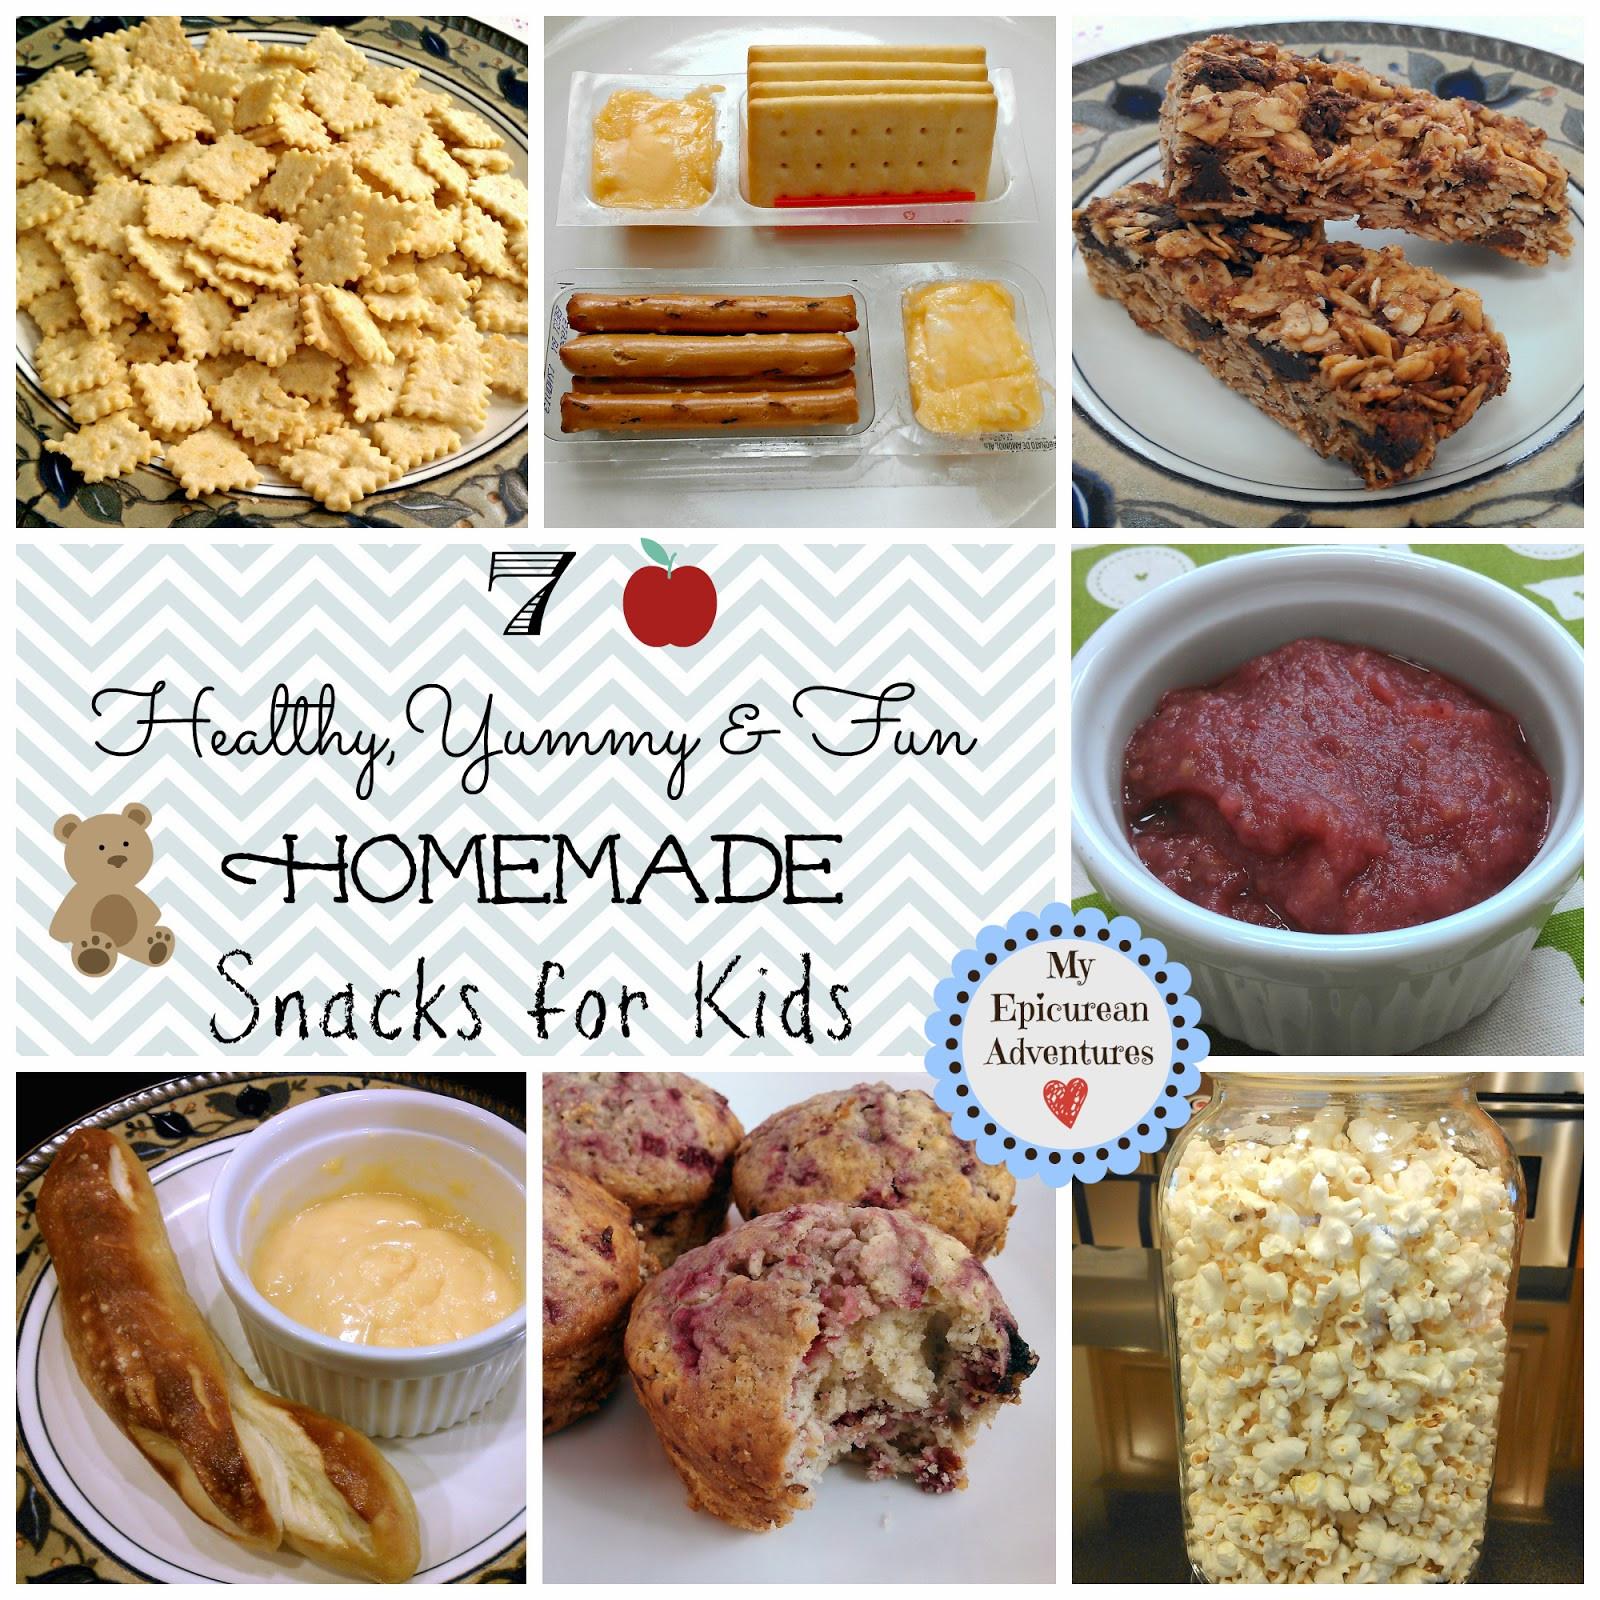 Healthy Yummy Snacks  7 Healthy Yummy and Fun Homemade Snacks for Kids My